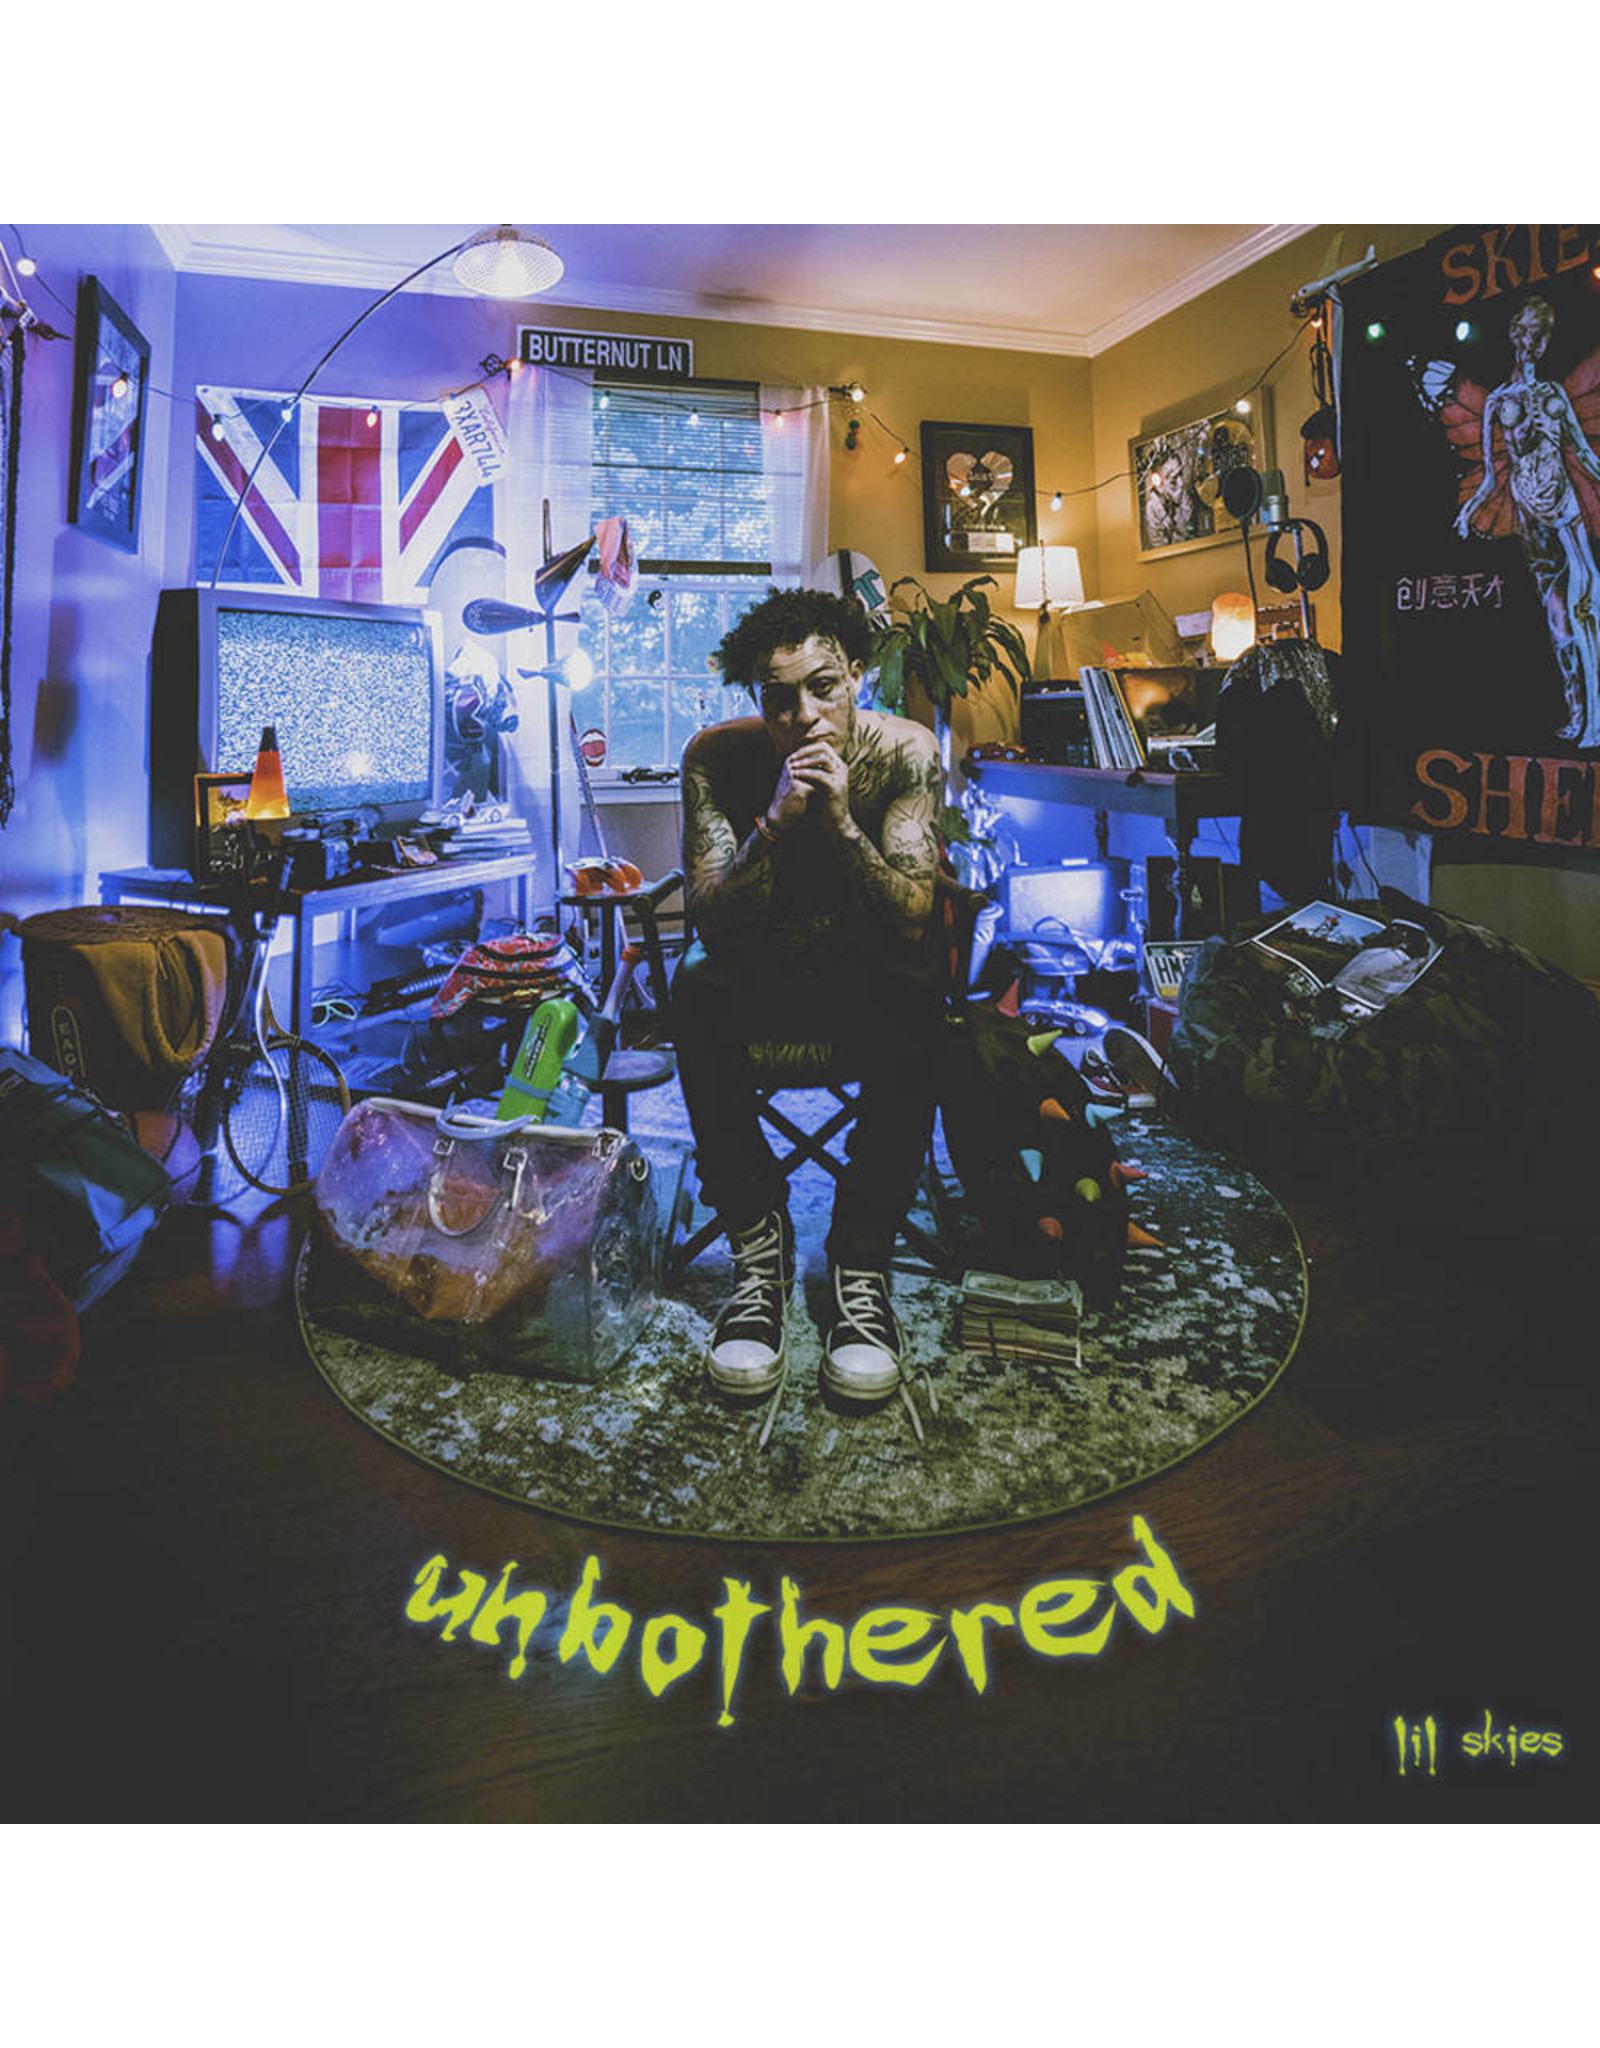 Lil Skies - Unbothered LP